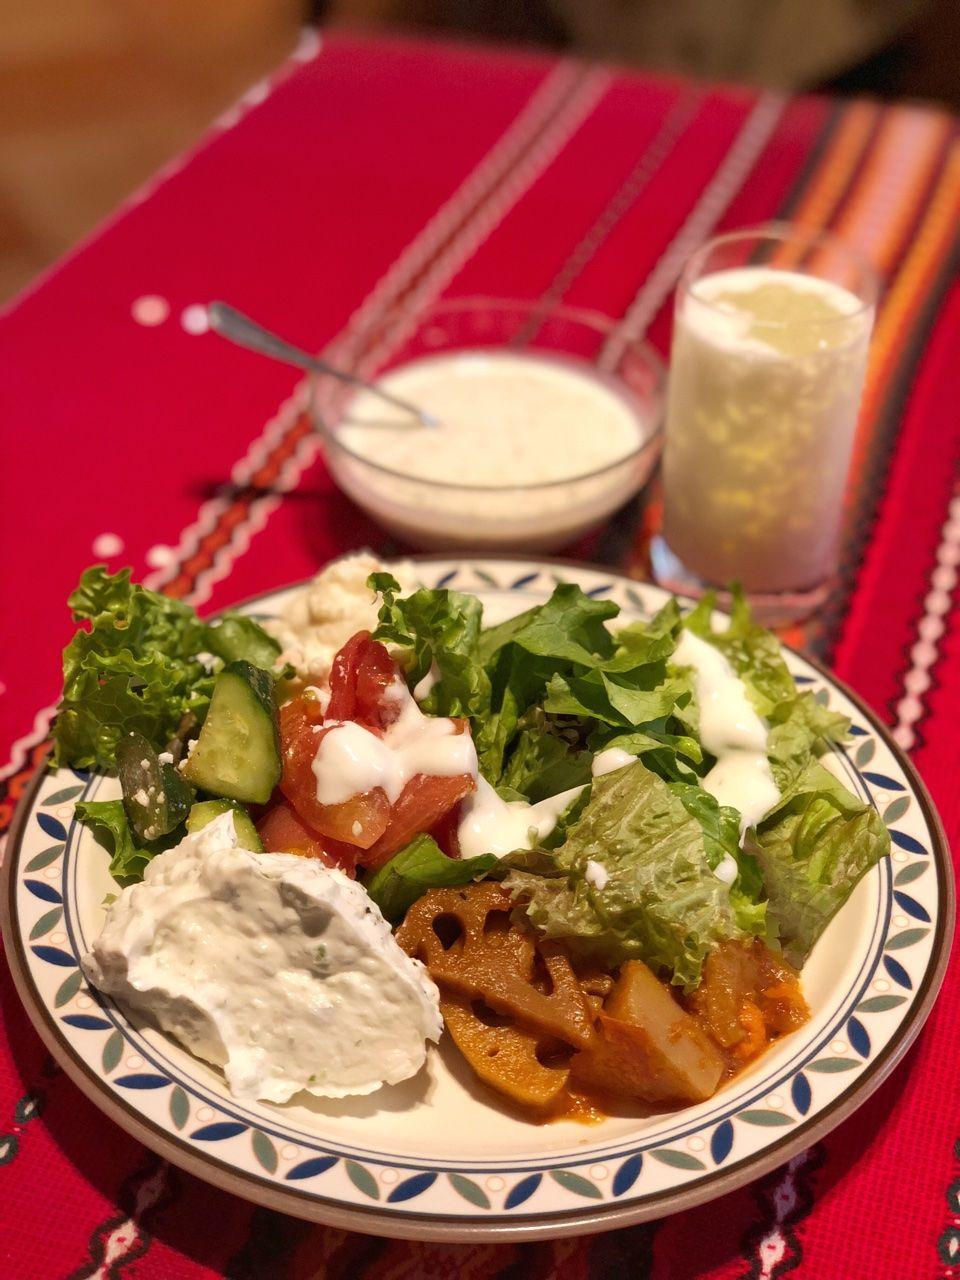 de96693e6bd8 選べるメインはキョフテ 前菜・サラダ・ドリンクビュッフェランチ@ブルガリアンダイニング トロヤン (銀座)